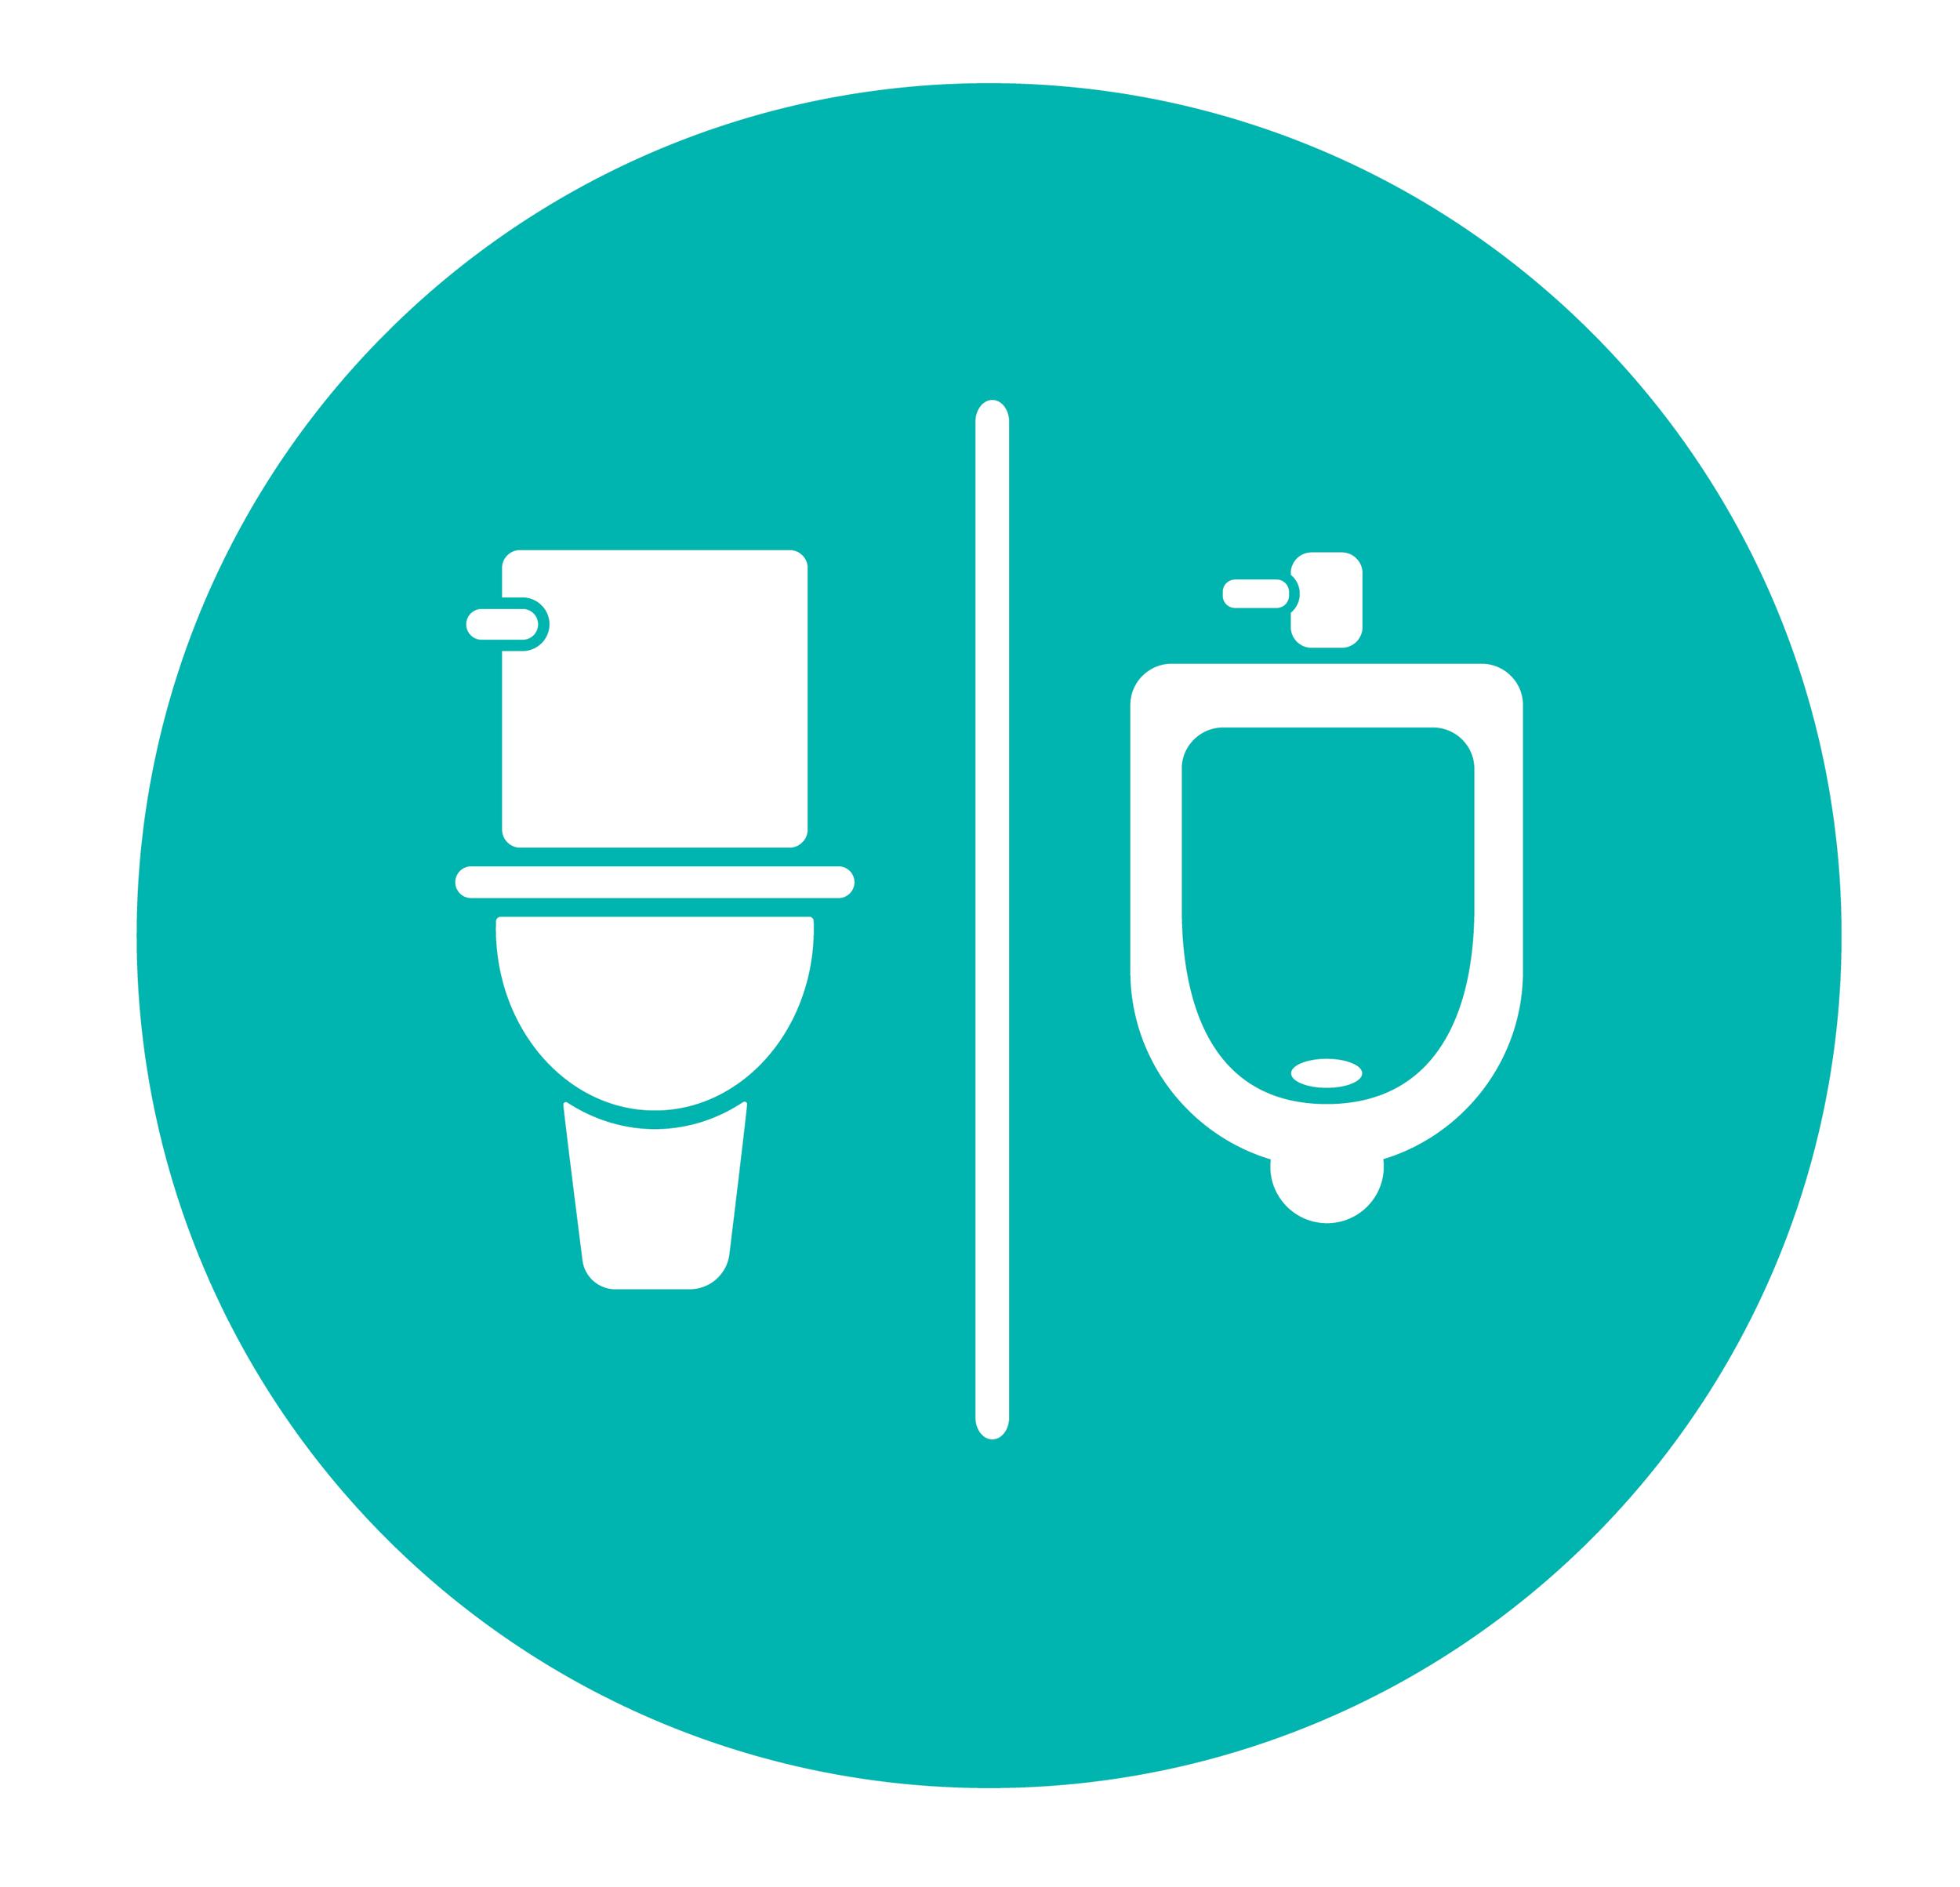 toilet-urinal.png